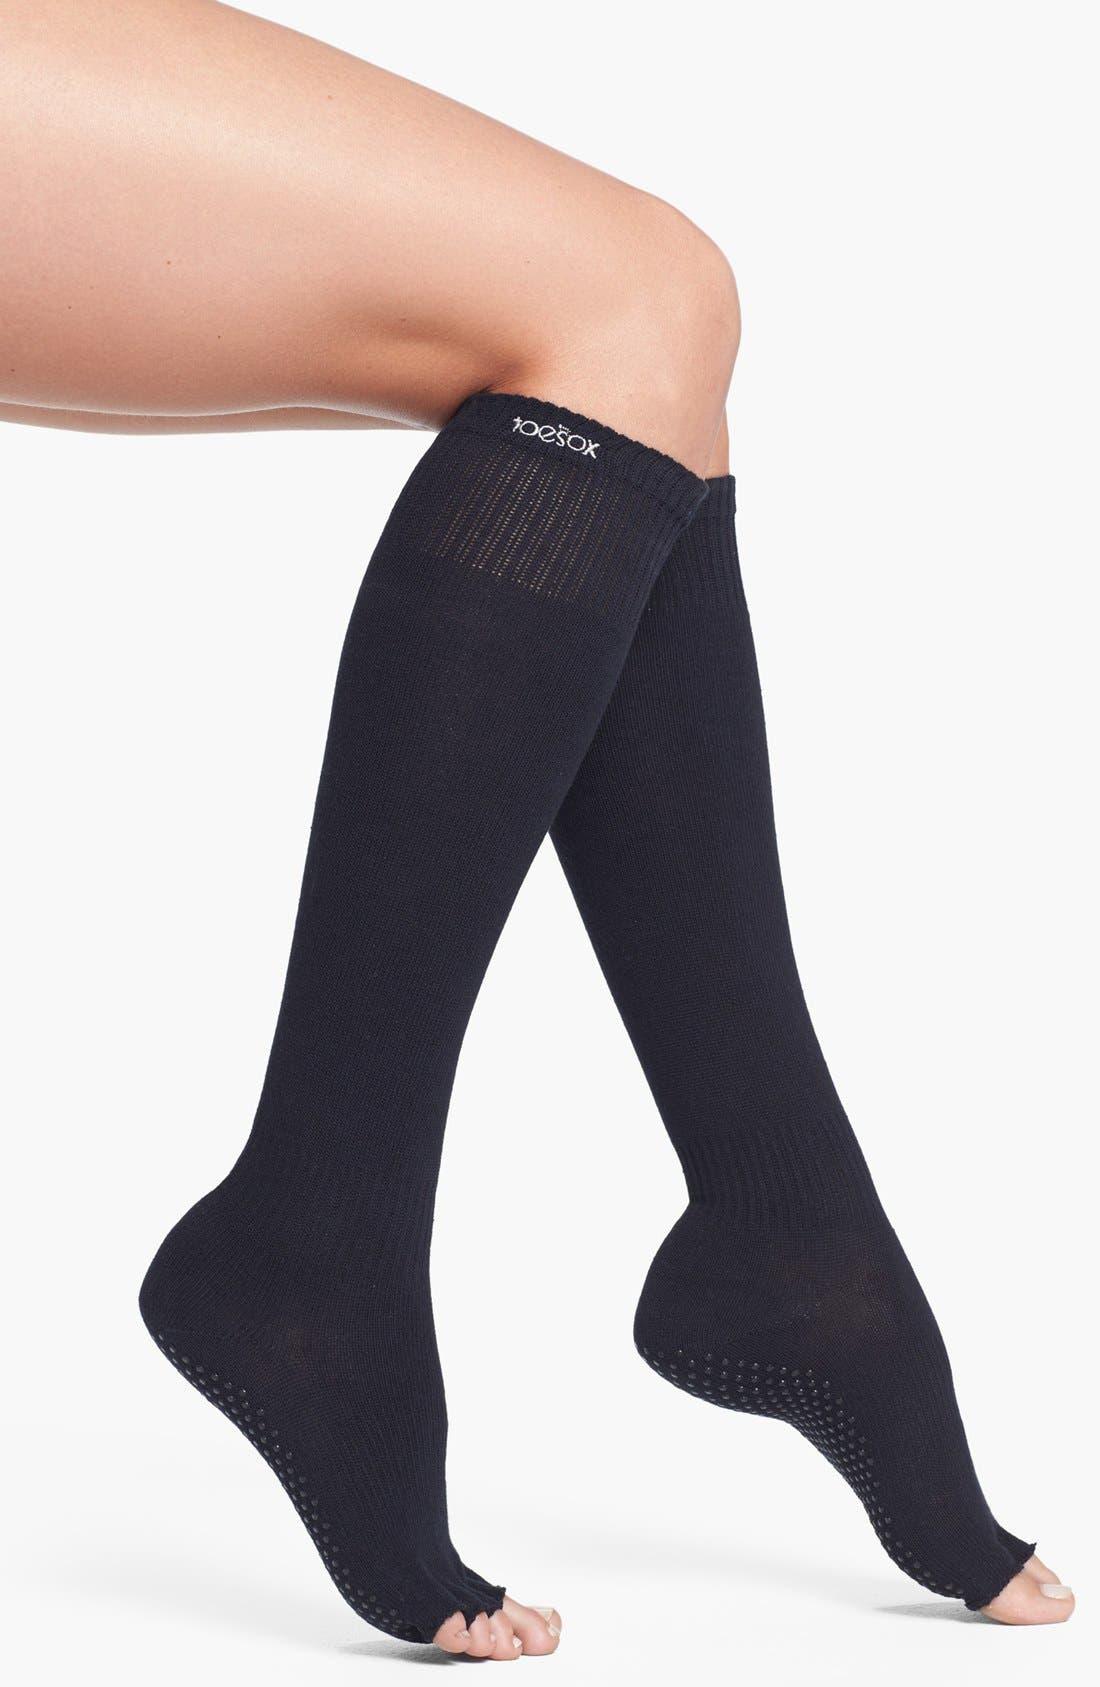 Main Image - ToeSox Scrunch Knee High Half Toe Socks